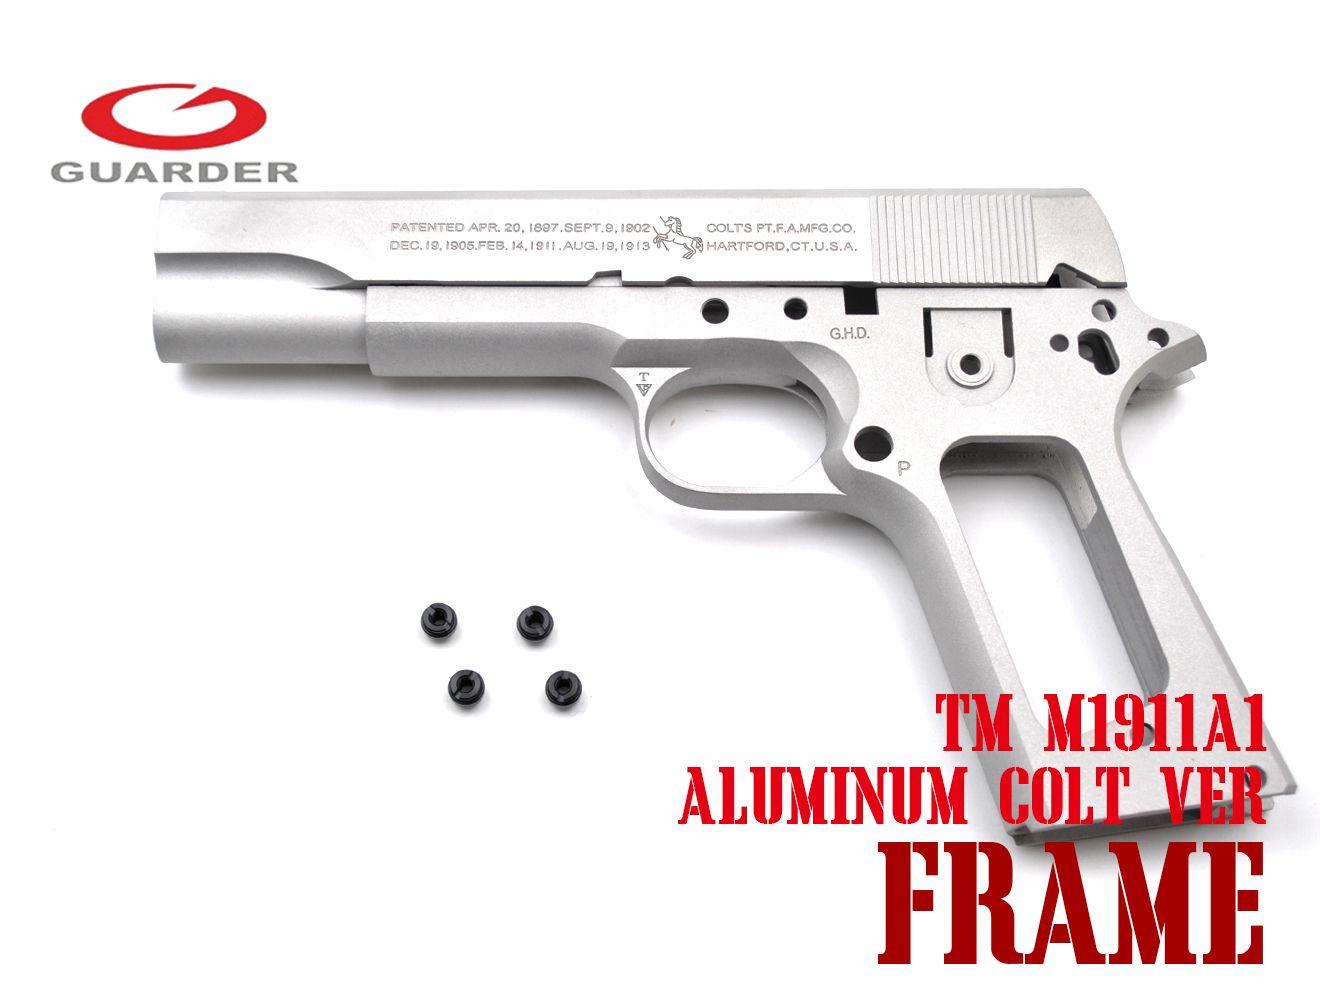 GUARDER Colt Ver アルミスライド&フレーム セット for TM M1911 SV★東京マルイ ガーダー ハンドガン GBB ガスブロ